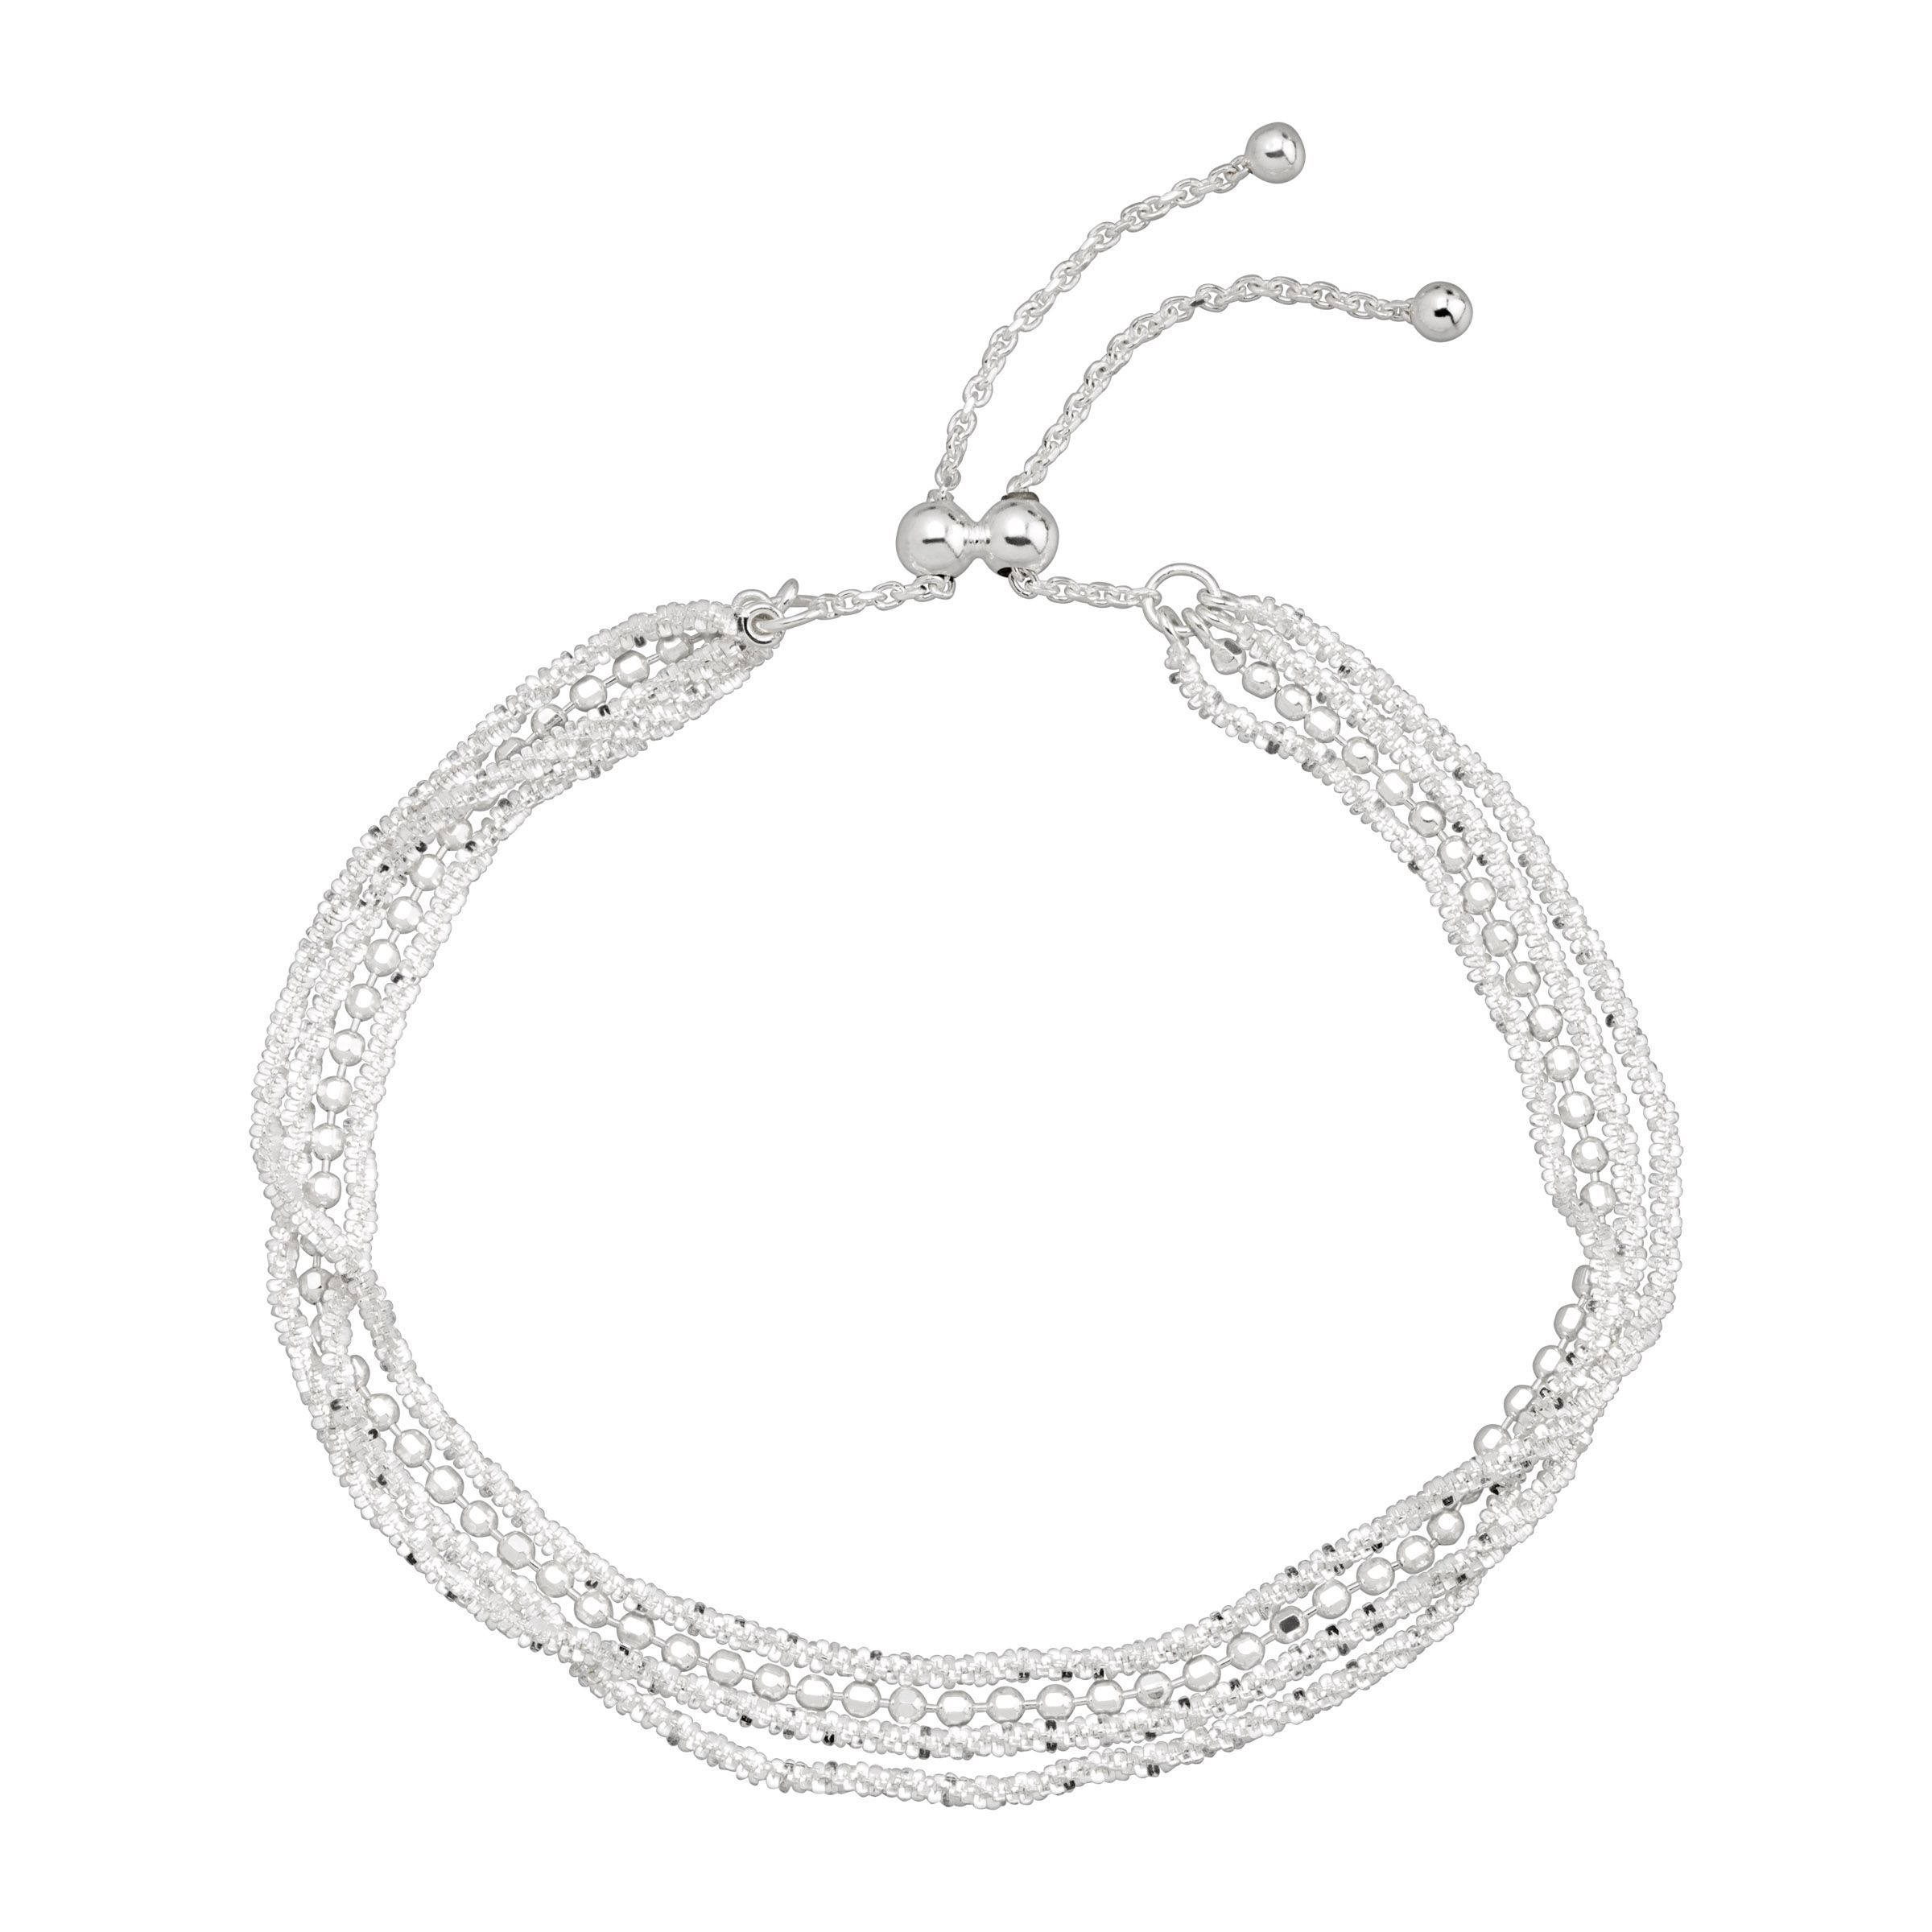 "Natural Orange pink coral 11-14mm irregular bead necklace chain gemstone 18-36/"""